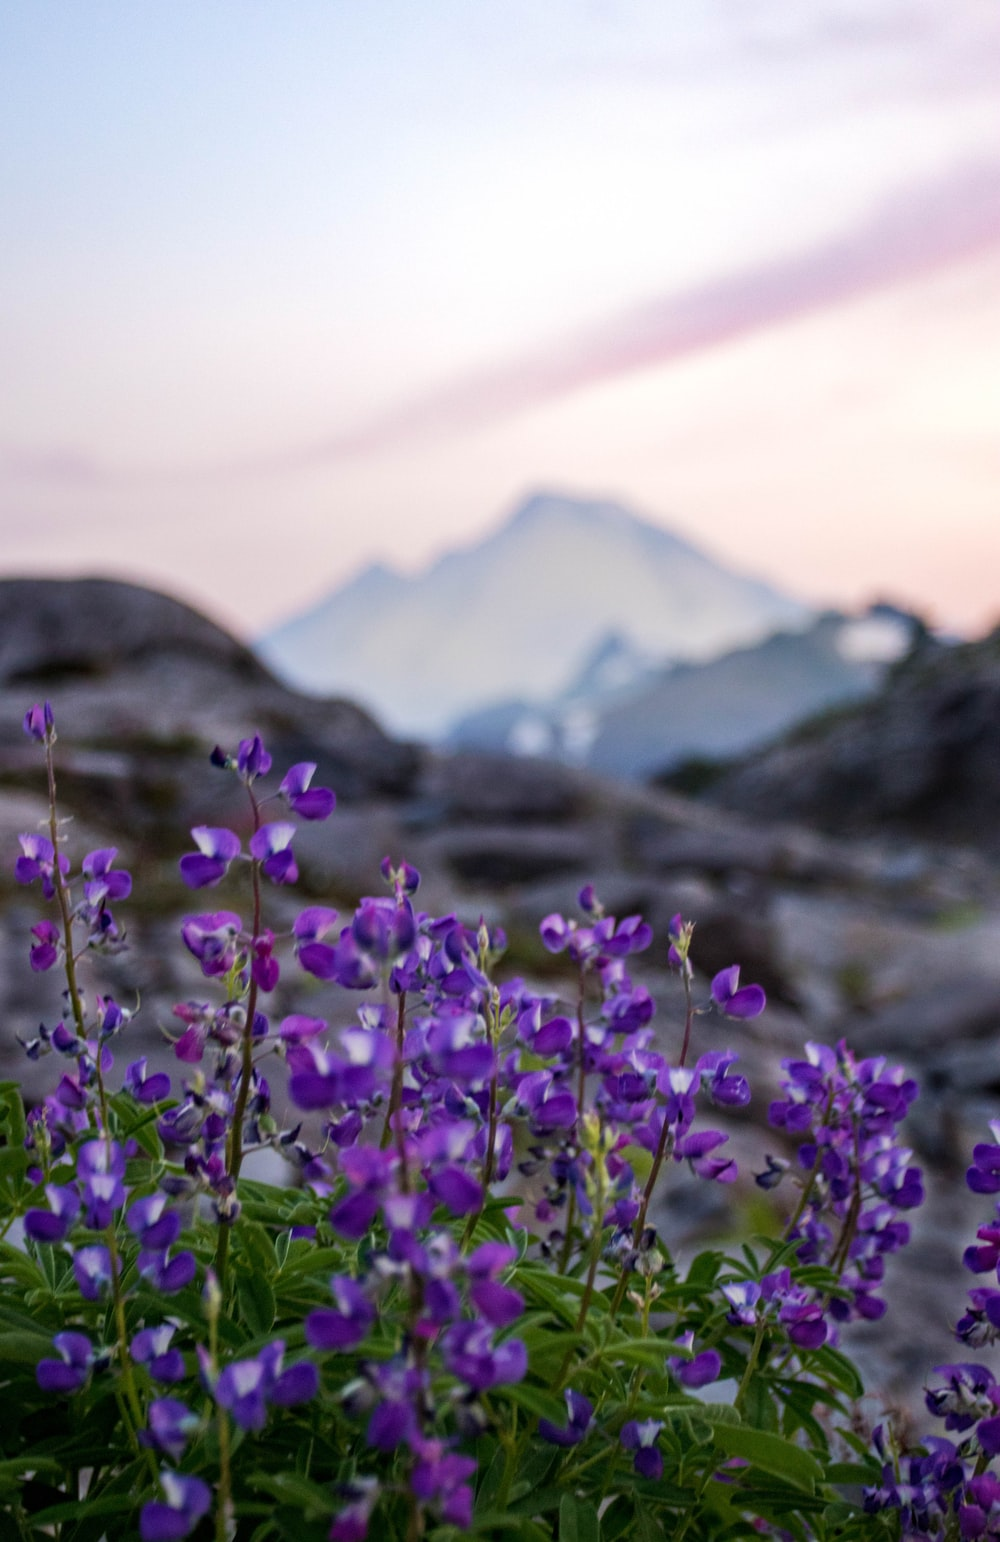 purple petaled flower near mountain range under gray clouds at daytime